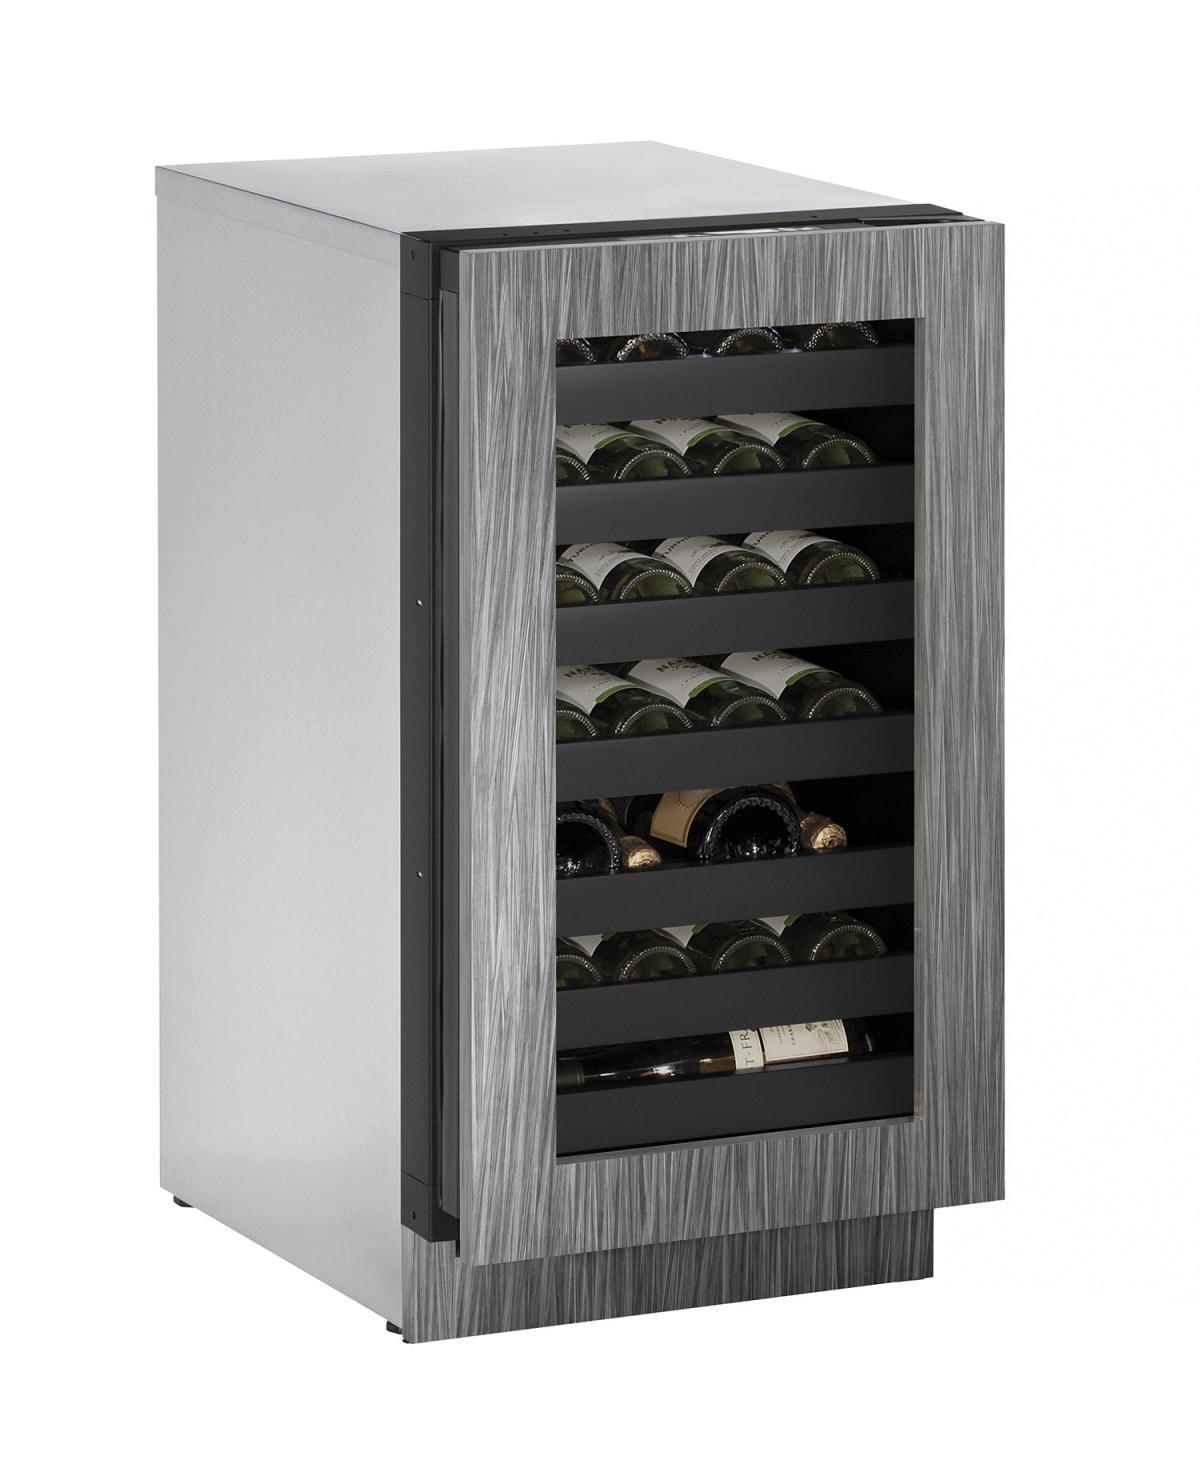 "U-Line Wine Captains 3.6 Cu. Ft. 18"" Built-In Wine Storage - Item Number: U-3018WCINT-00A"